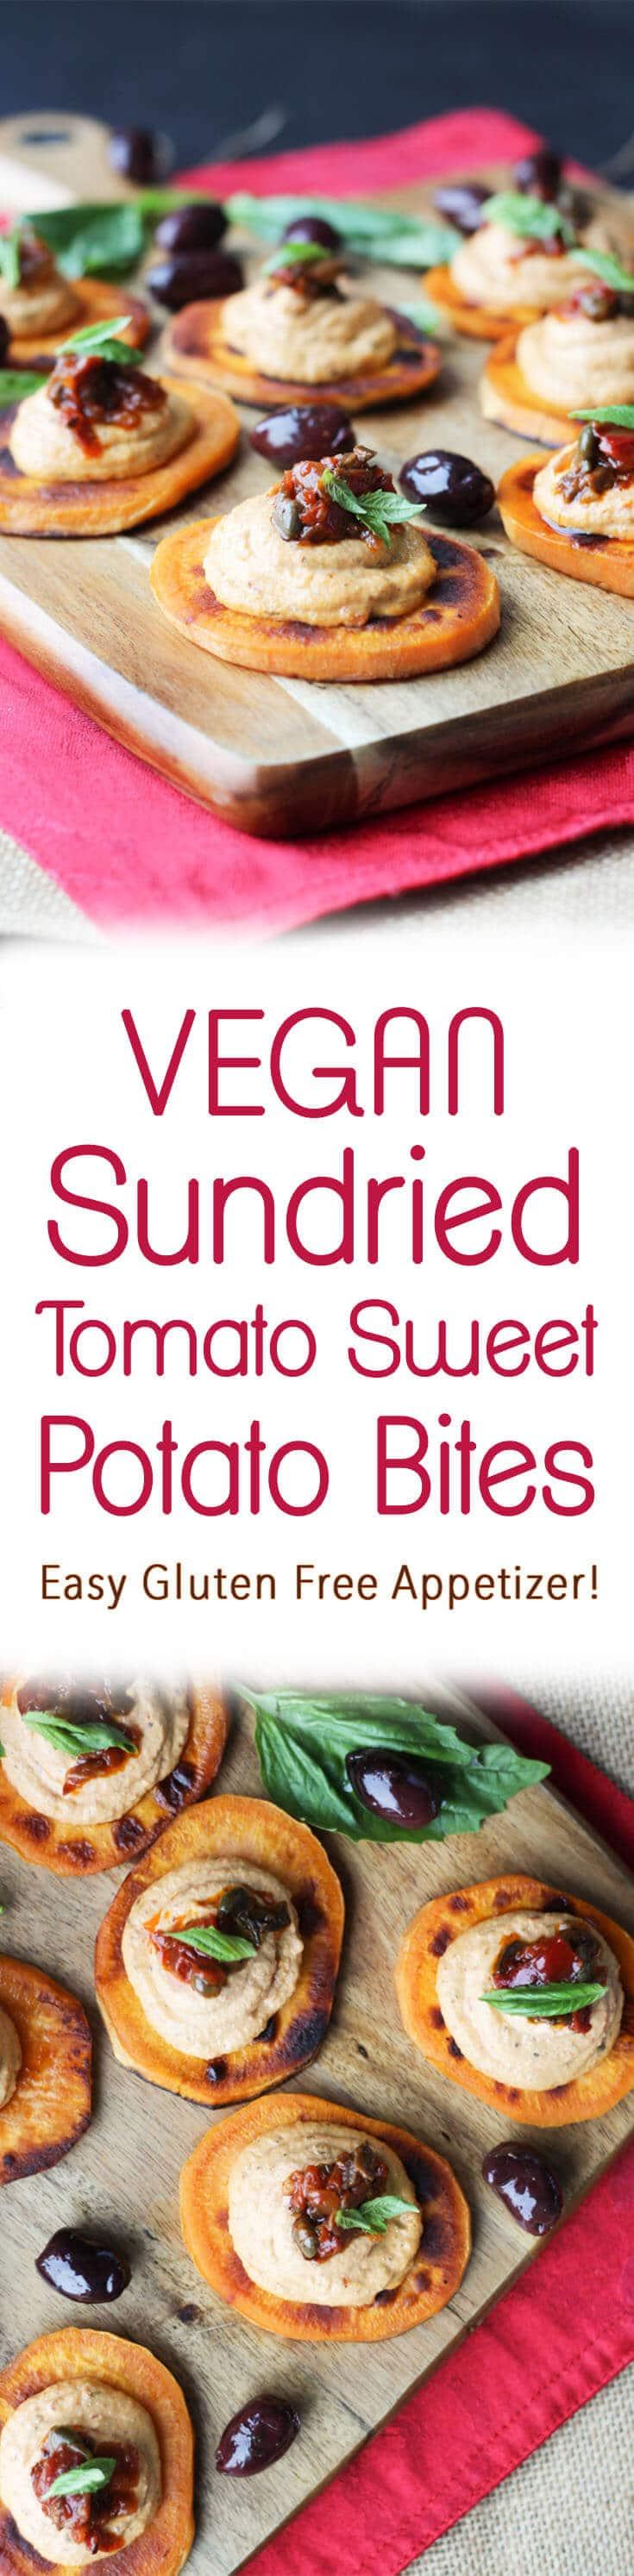 "A pinterest image of multiple sweet potato bites with the text overlay \""Vegan Sundried Tomato Sweet Potato Bites Easy Gluten Free Appetizer!\"""